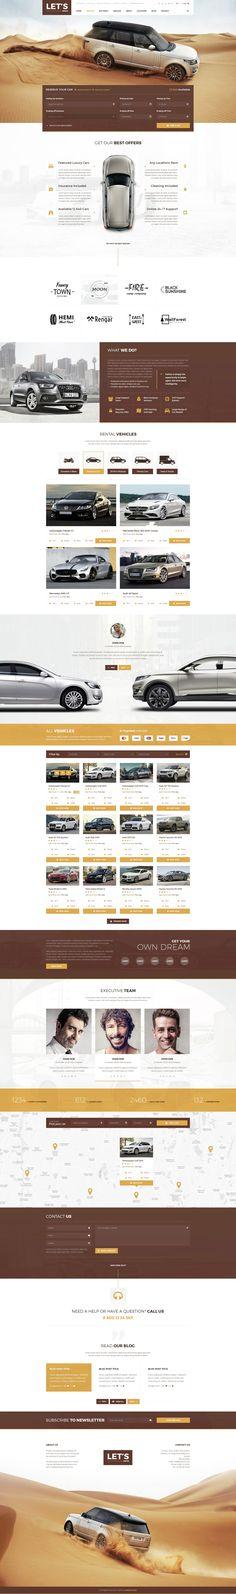 Let's Drive - Amazing Car Rental & Sale PSD Template - PSD Templates